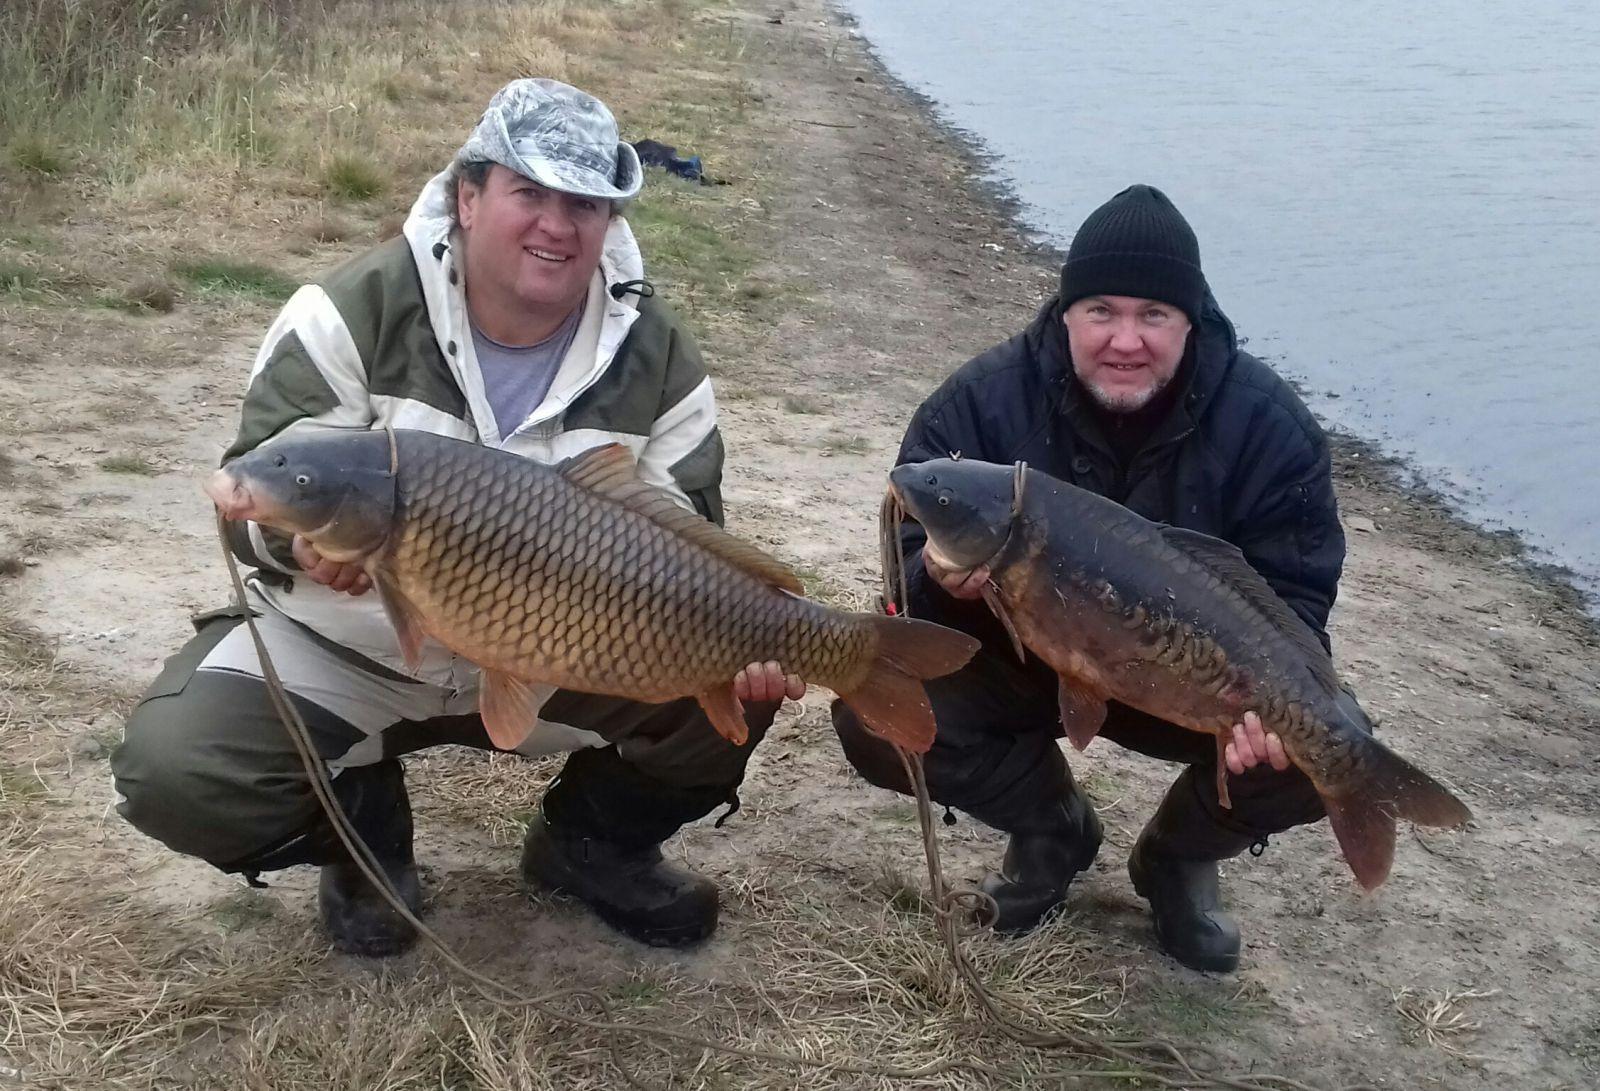 Два рыбака с крупной рыбой